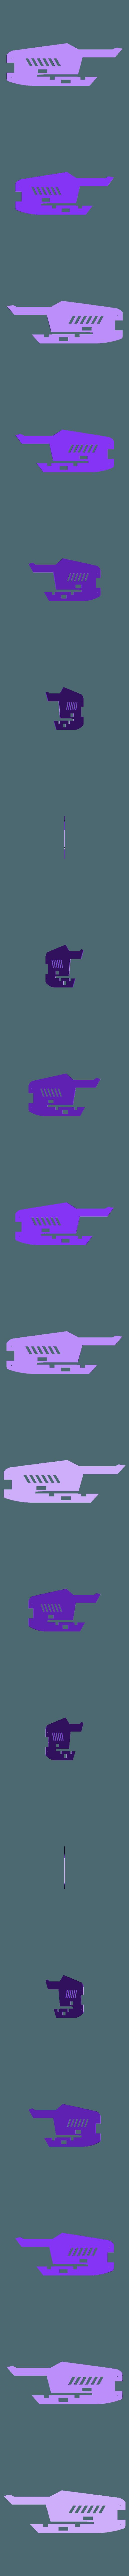 Body Front Cowling Rev01.STL Download free STL file V1 Release - New RC Plane • 3D printable design, Trikonics